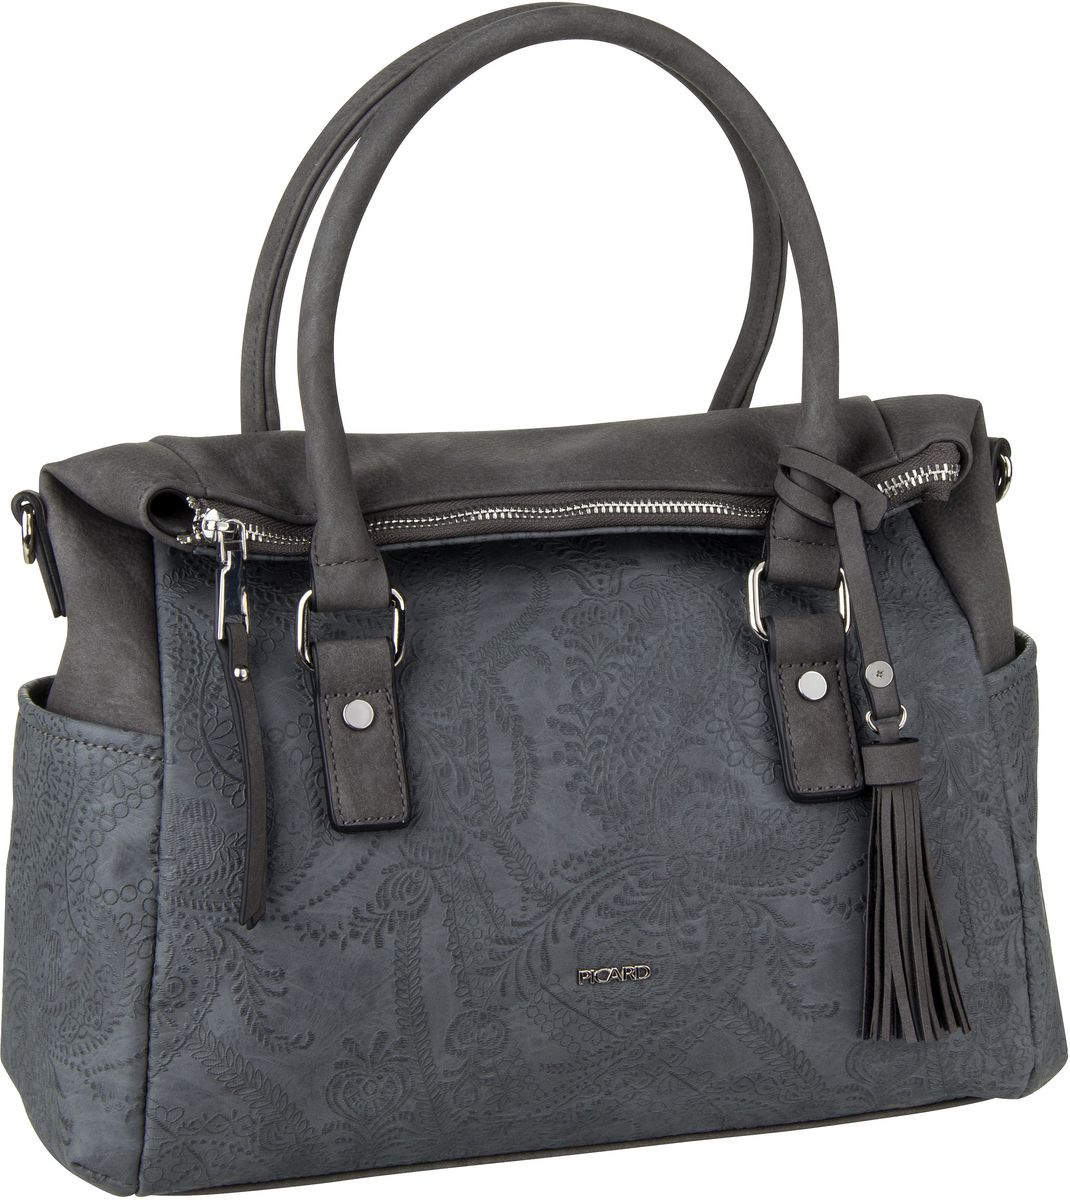 Handtasche Stephanie 2586 Charcoal